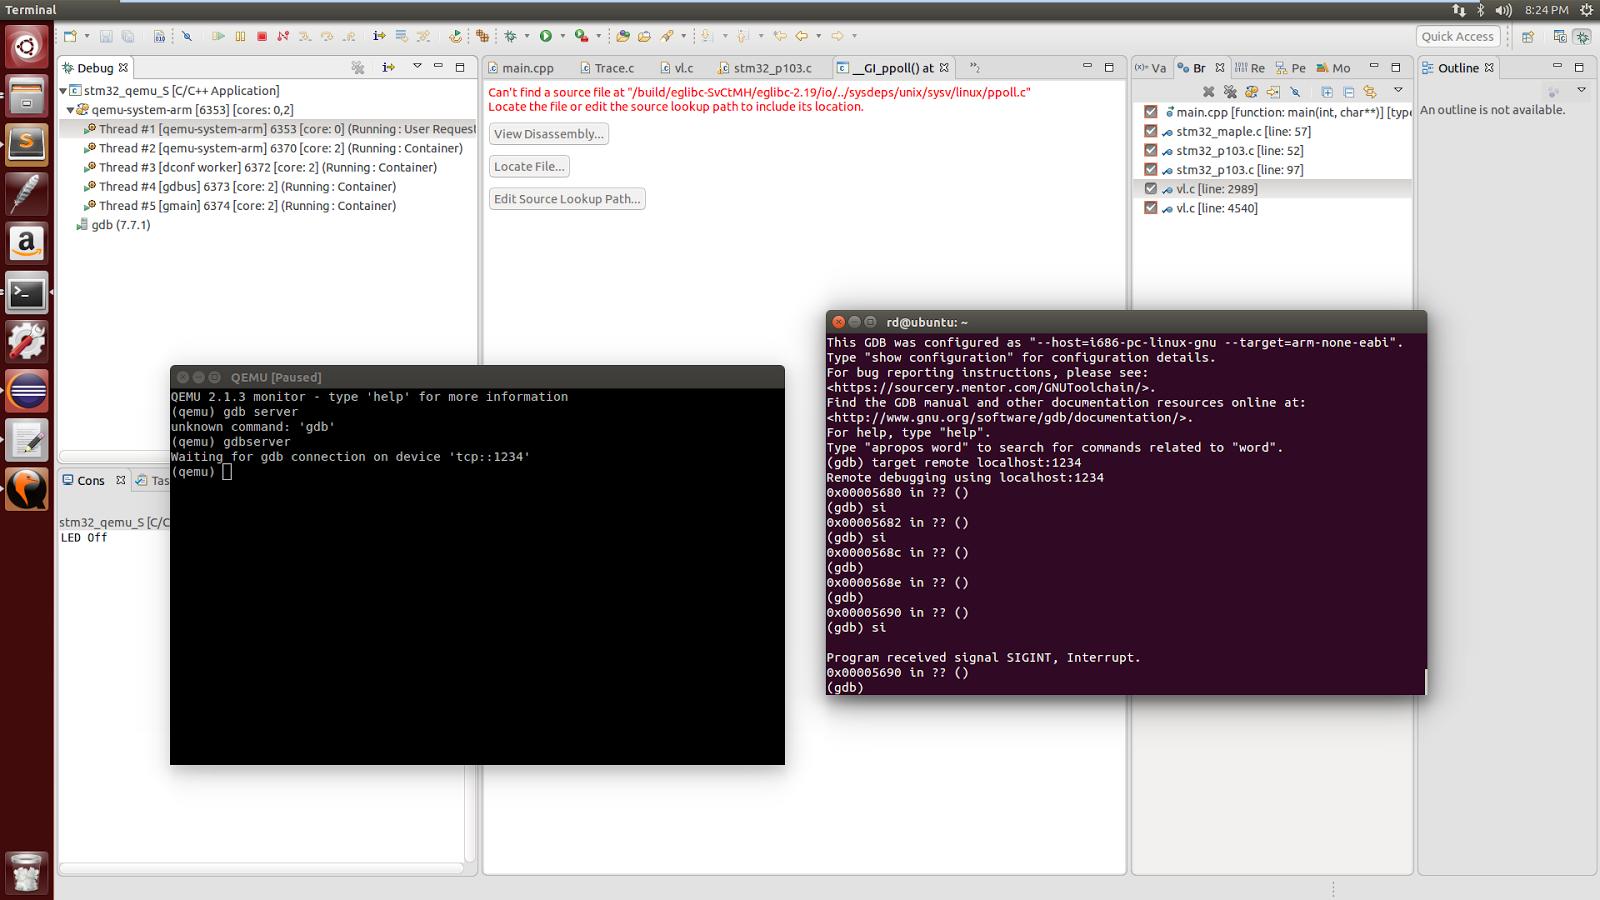 My Blog log: Journey of emulating embedded hardware with QEMU